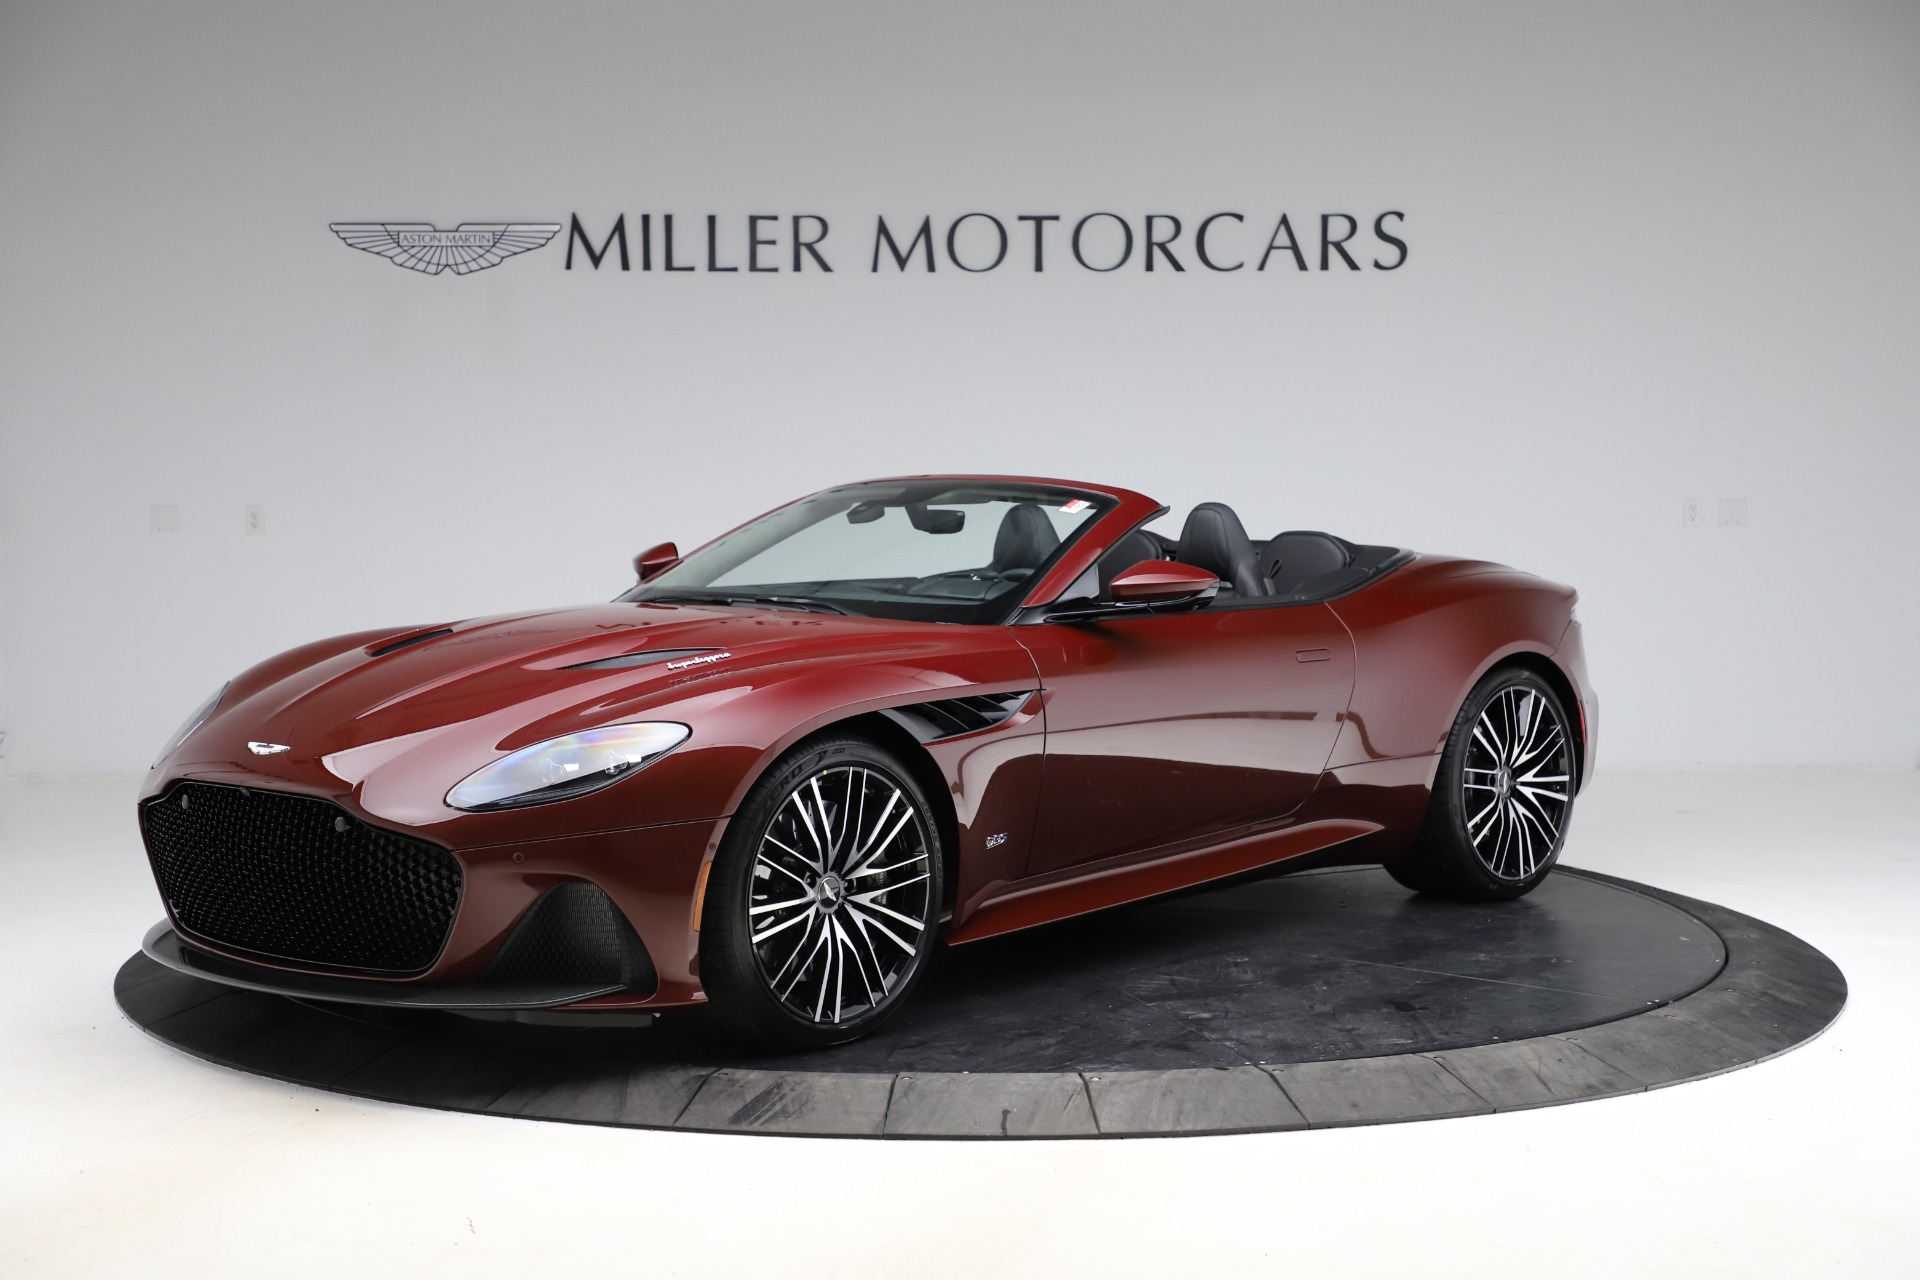 New 2021 Aston Martin DBS Superleggera Volante Convertible for sale $362,486 at Pagani of Greenwich in Greenwich CT 06830 1